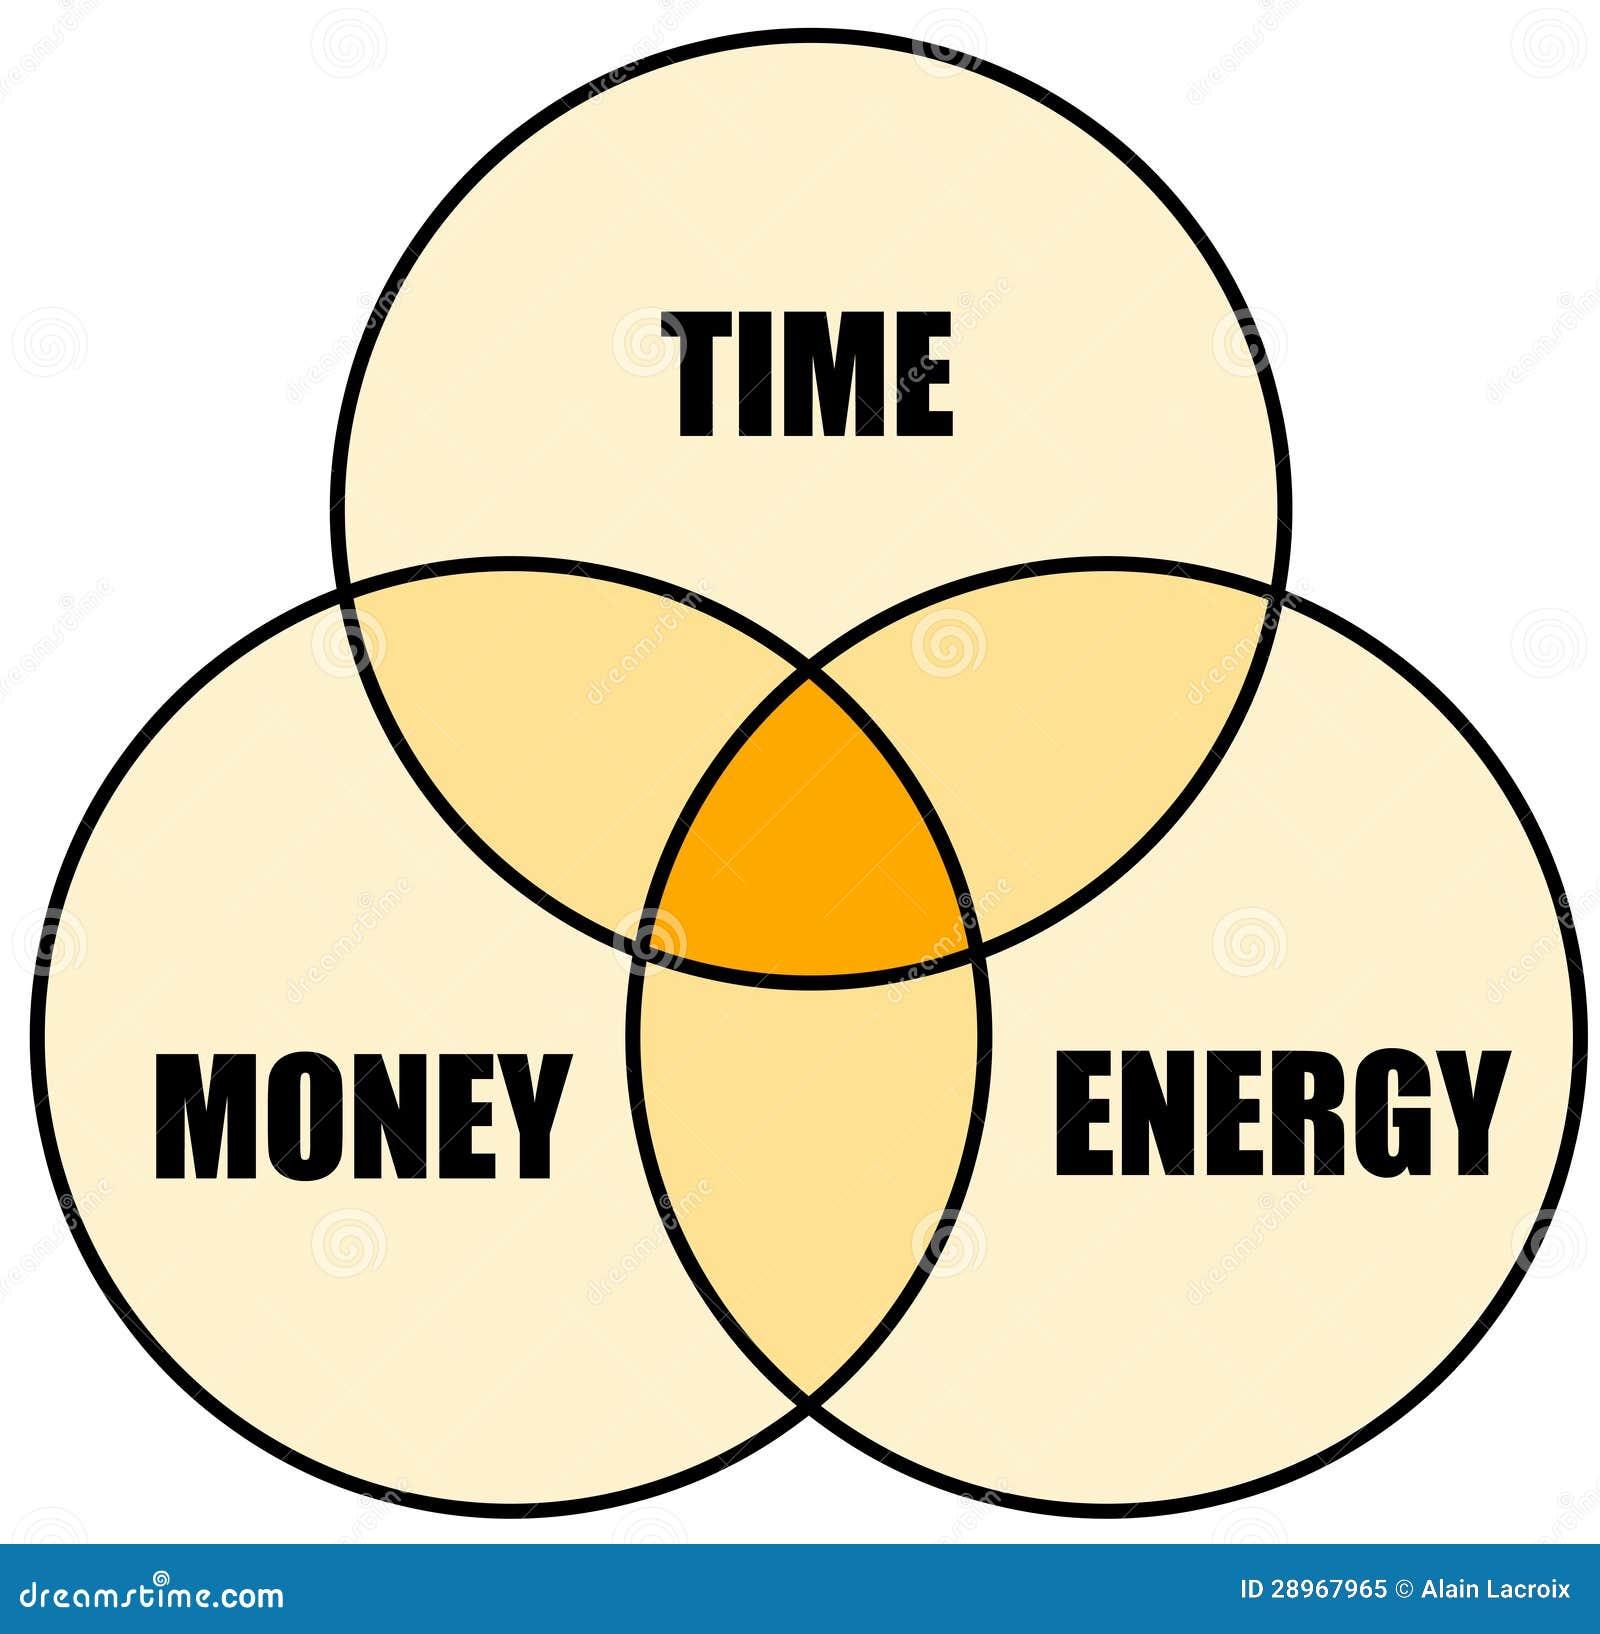 Time Money Energy Royalty Free Stock Photo Image 28967965